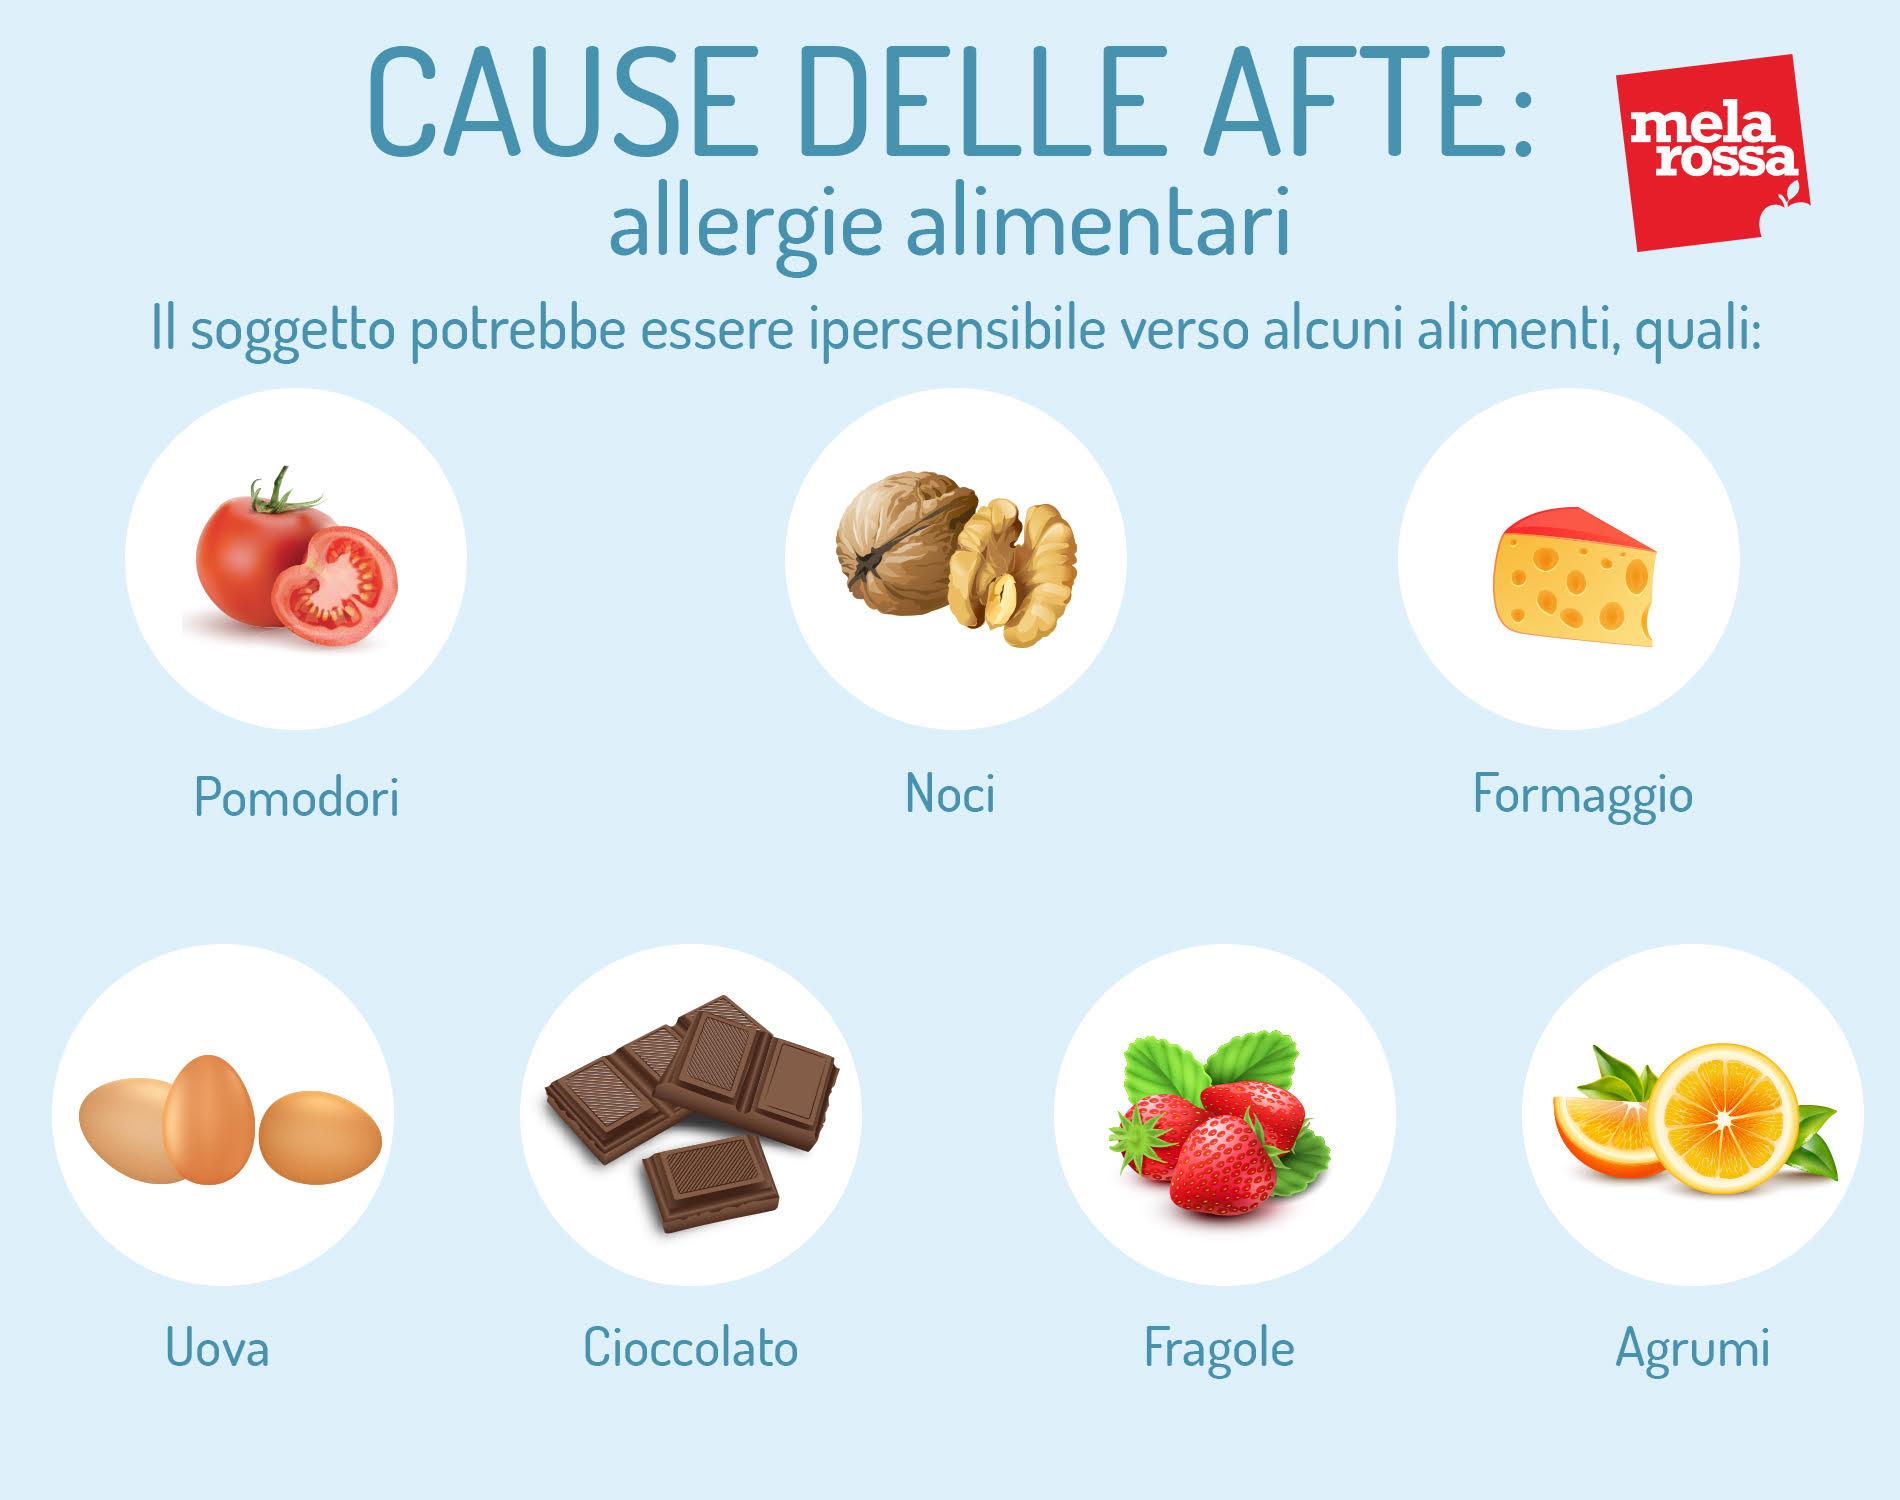 Cause delle afte: allergie alimentari